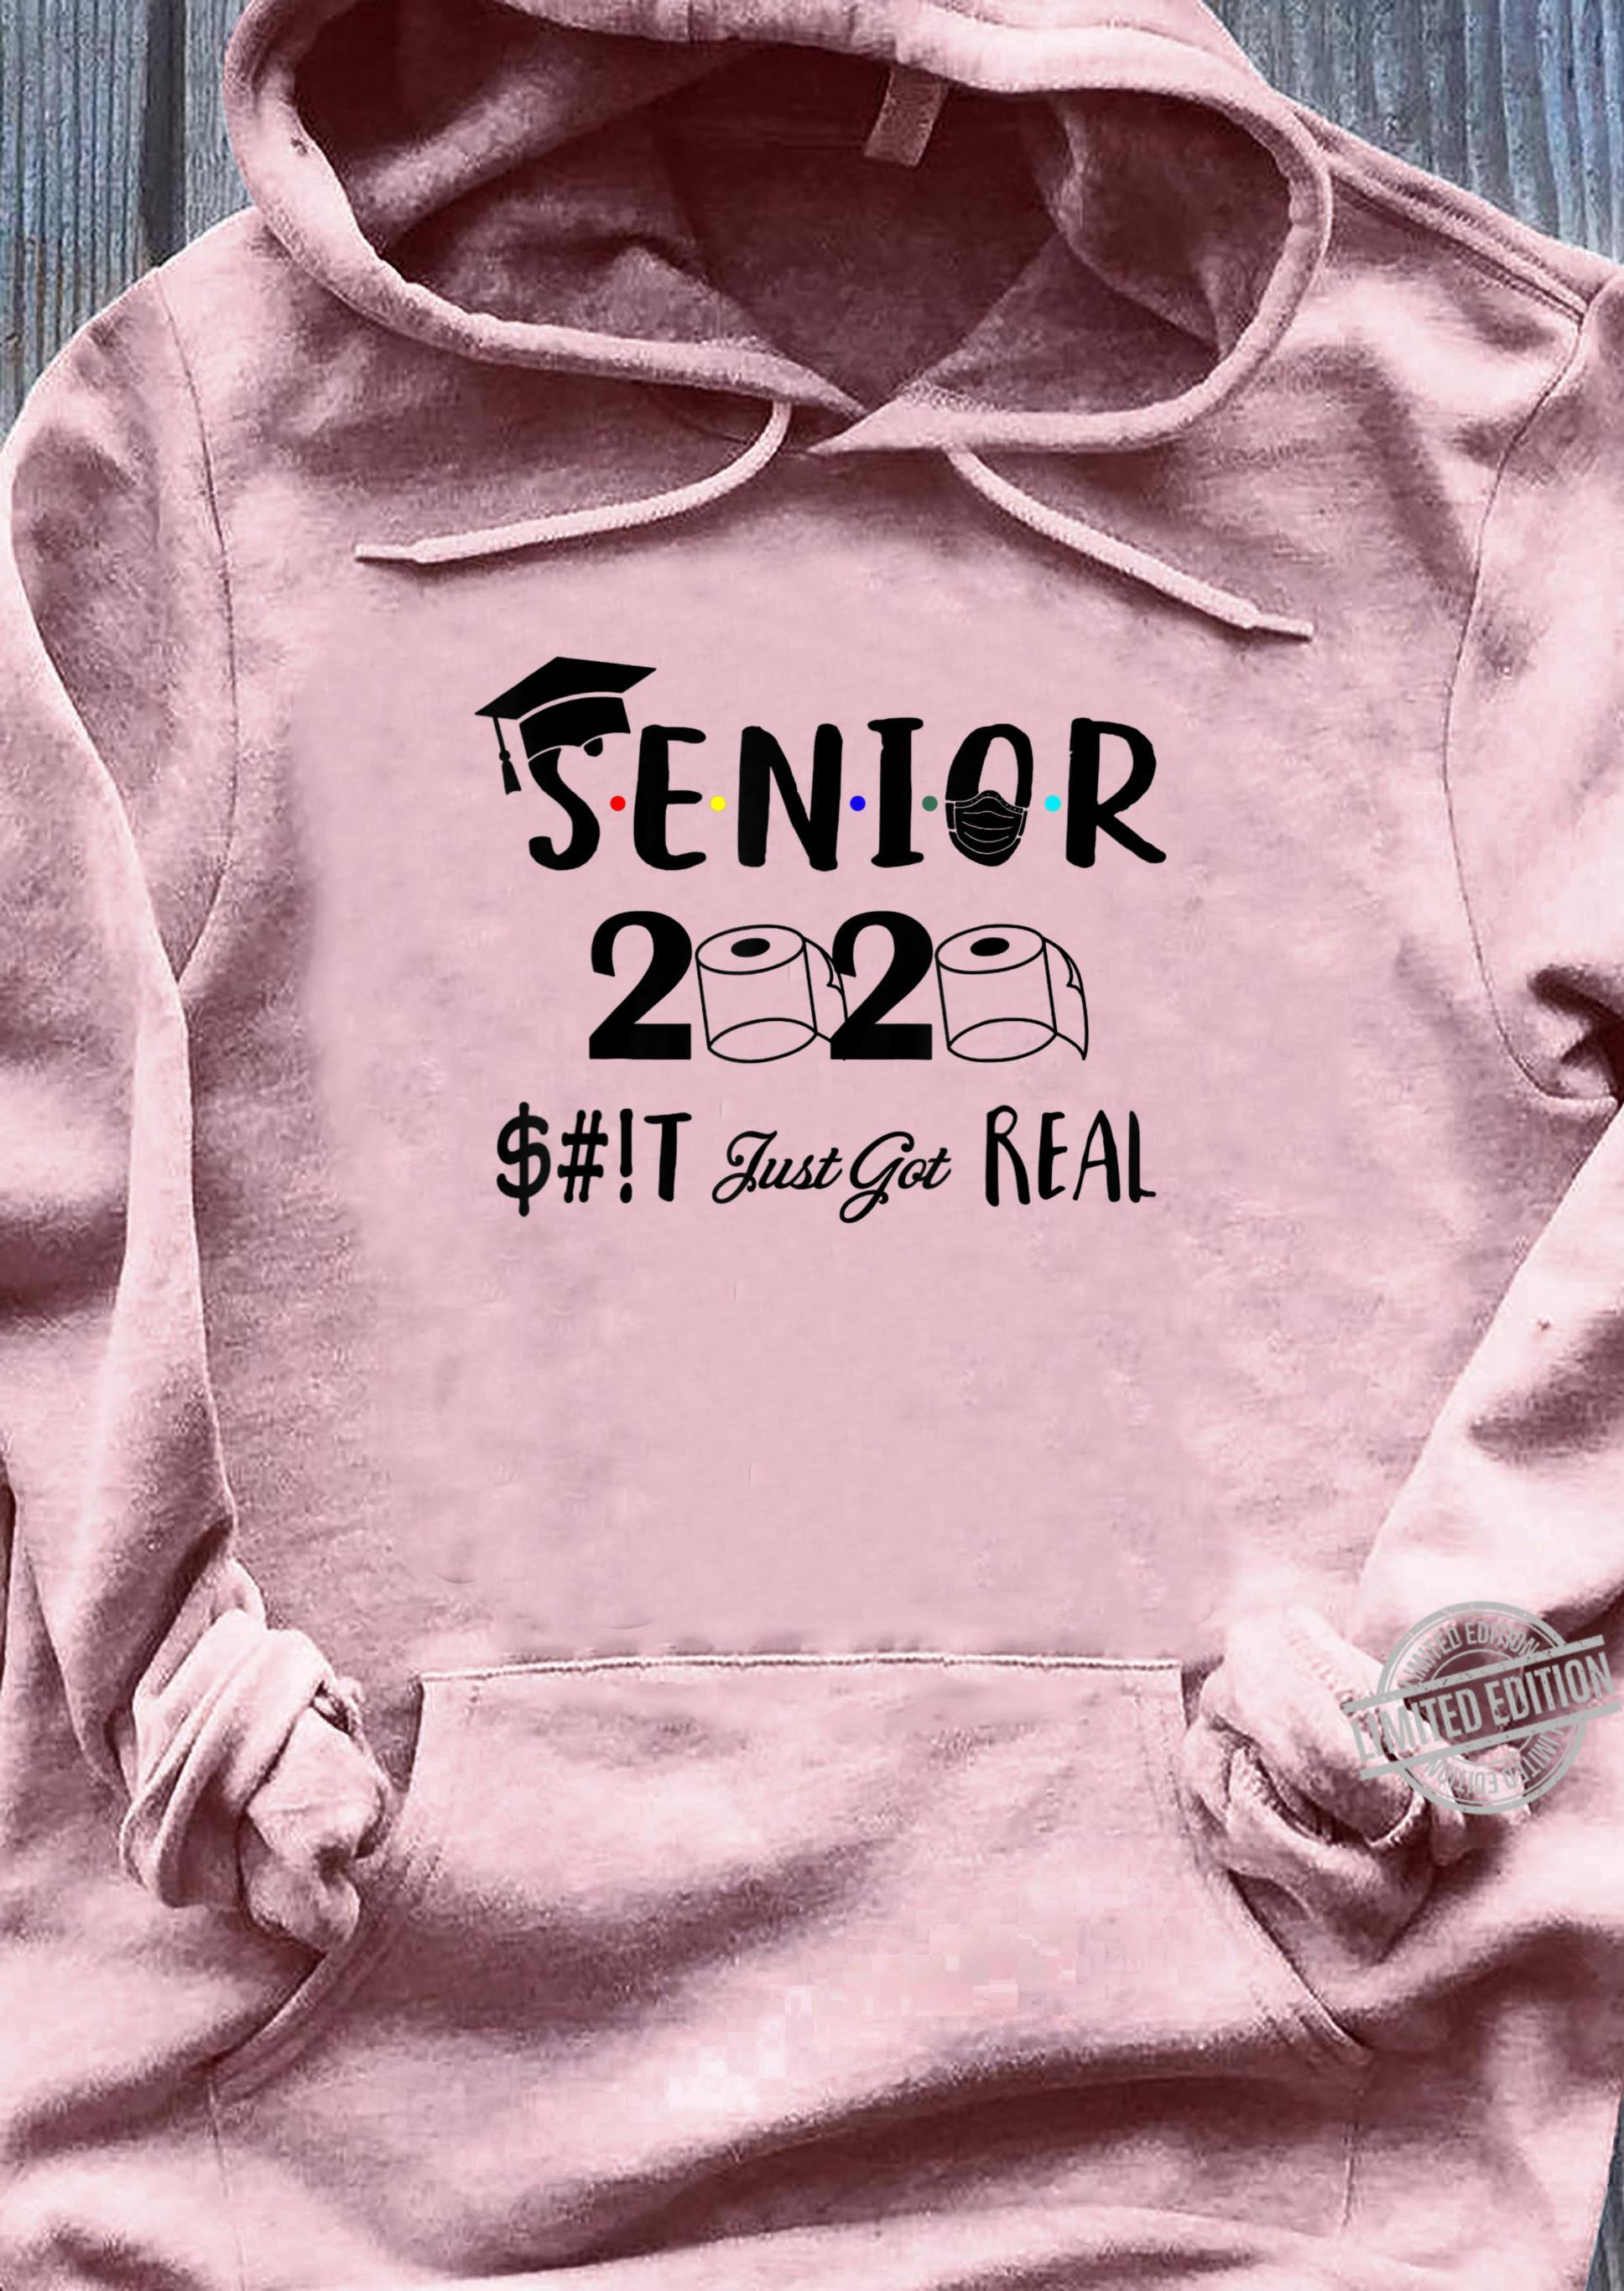 Senior Class Of 2020 Shit Just Got Real Graduation Shirt ladies tee